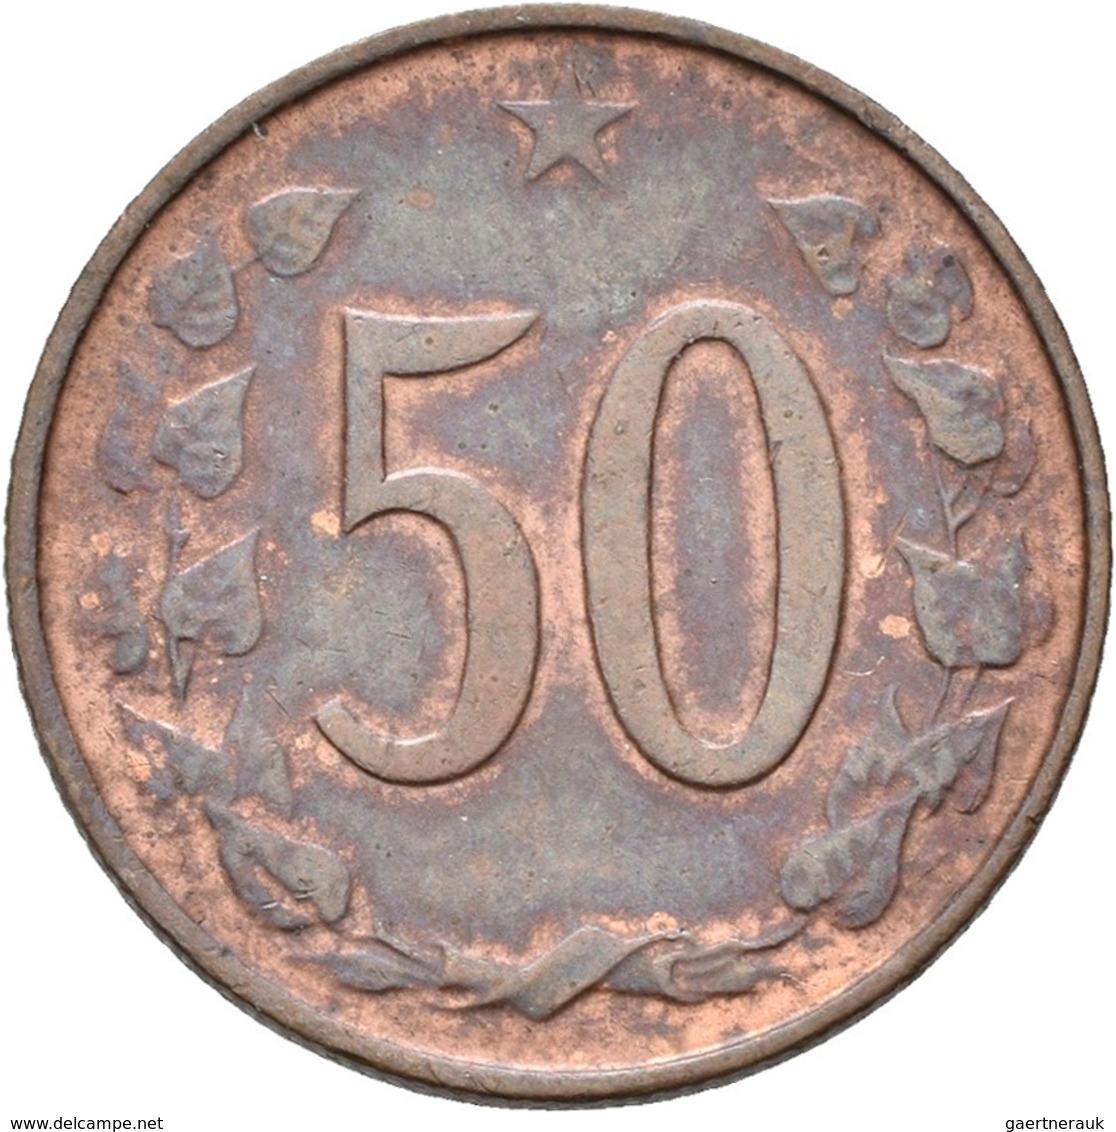 Tschechoslowakei: Lot 2 Münzen, Vatianten: 1) 10 Heller 1963 Mit Punkten, KM# 49.2, Novotny 62, Sehr - Tschechoslowakei